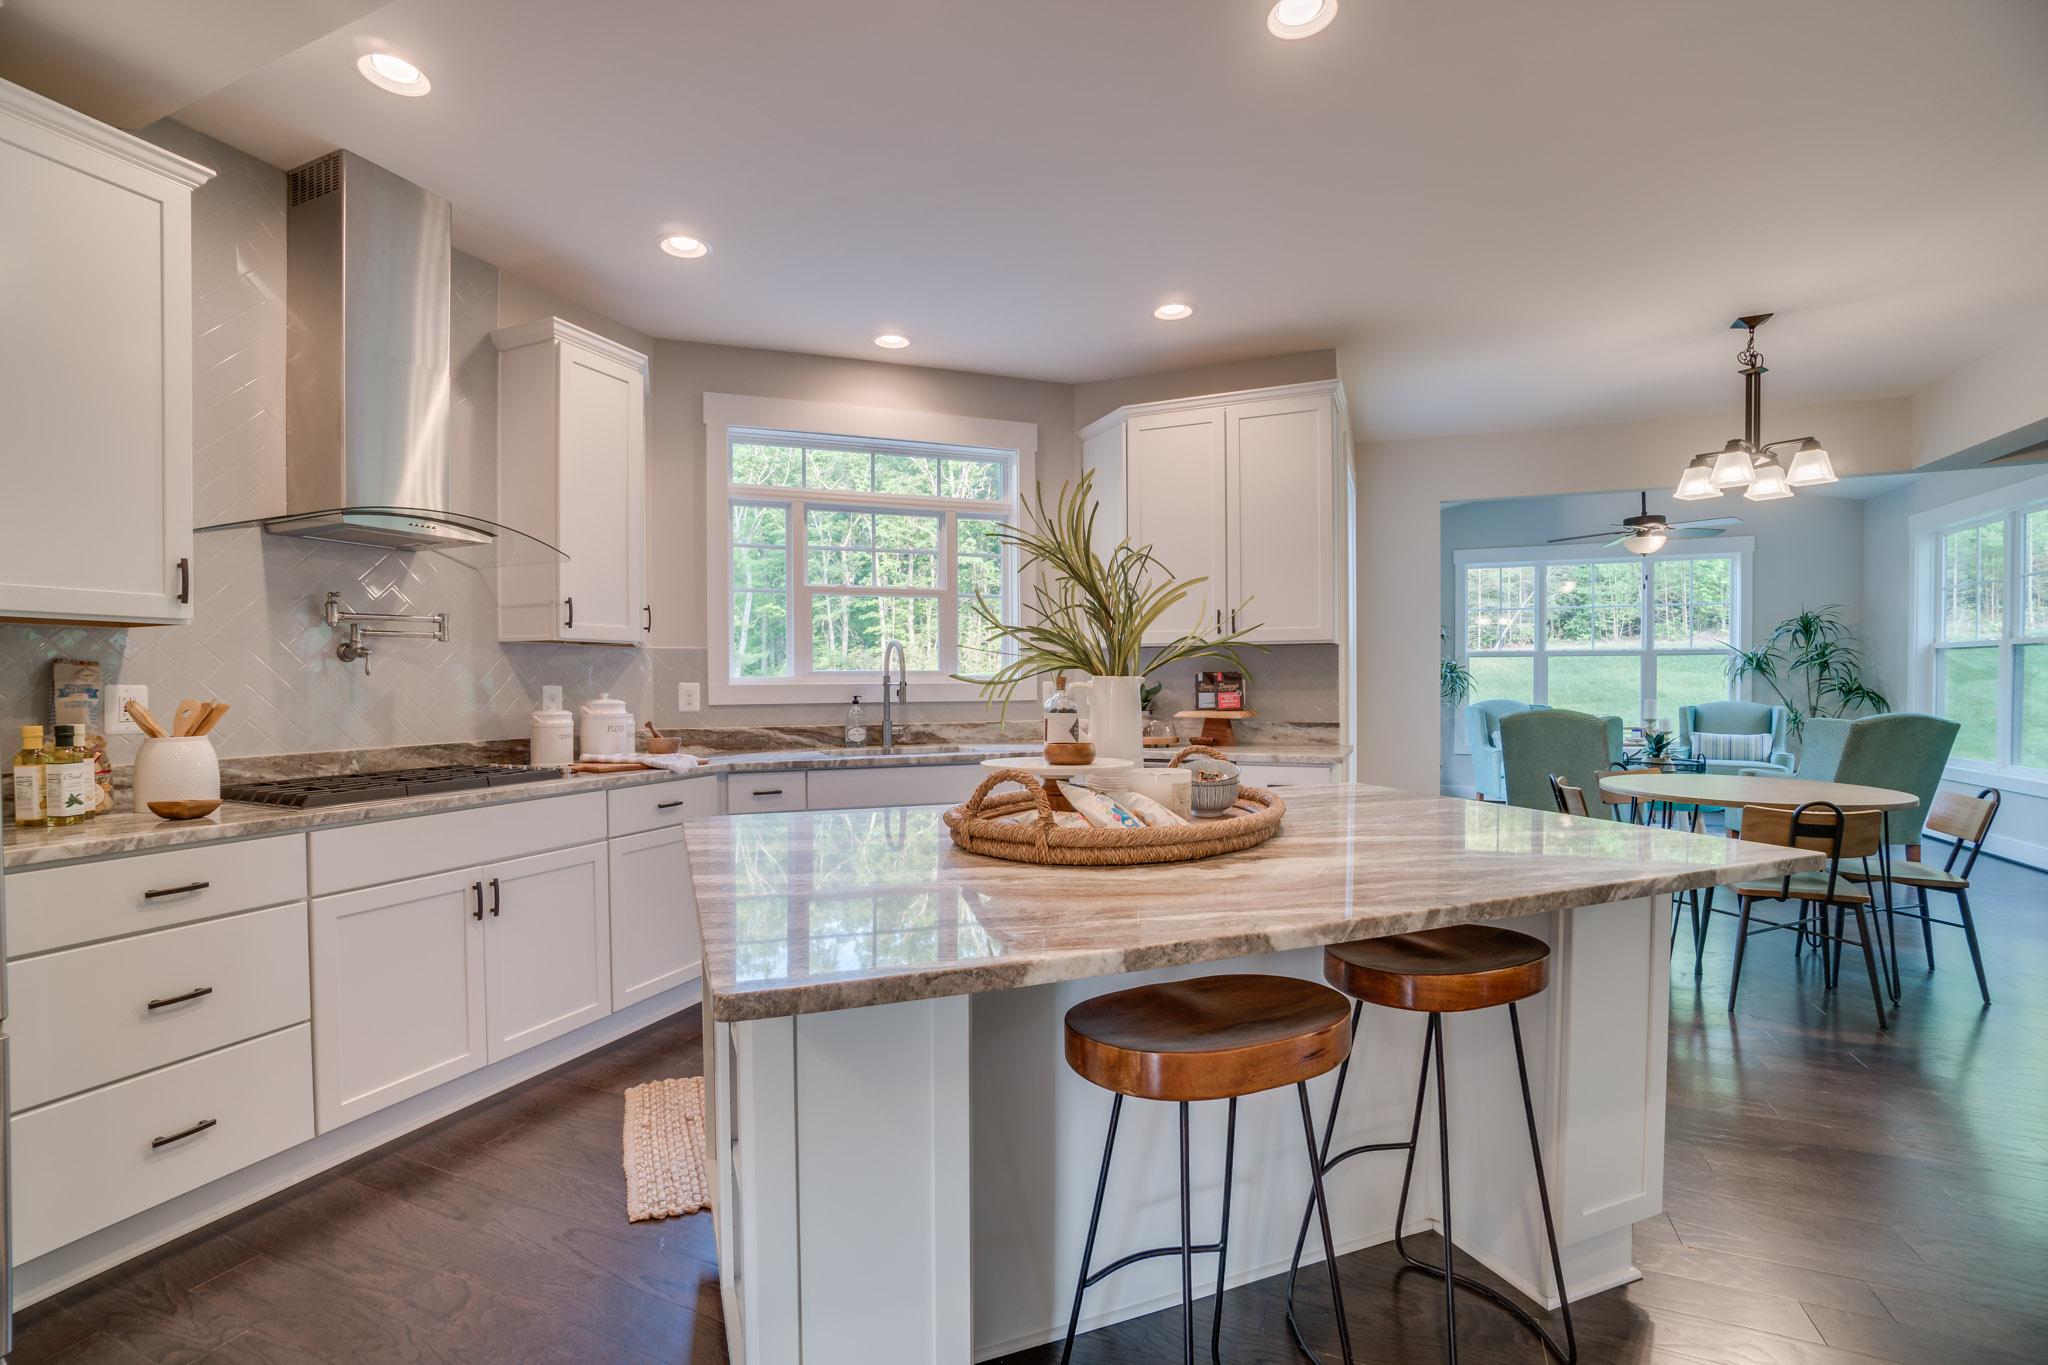 Stafford, VA Home Builder